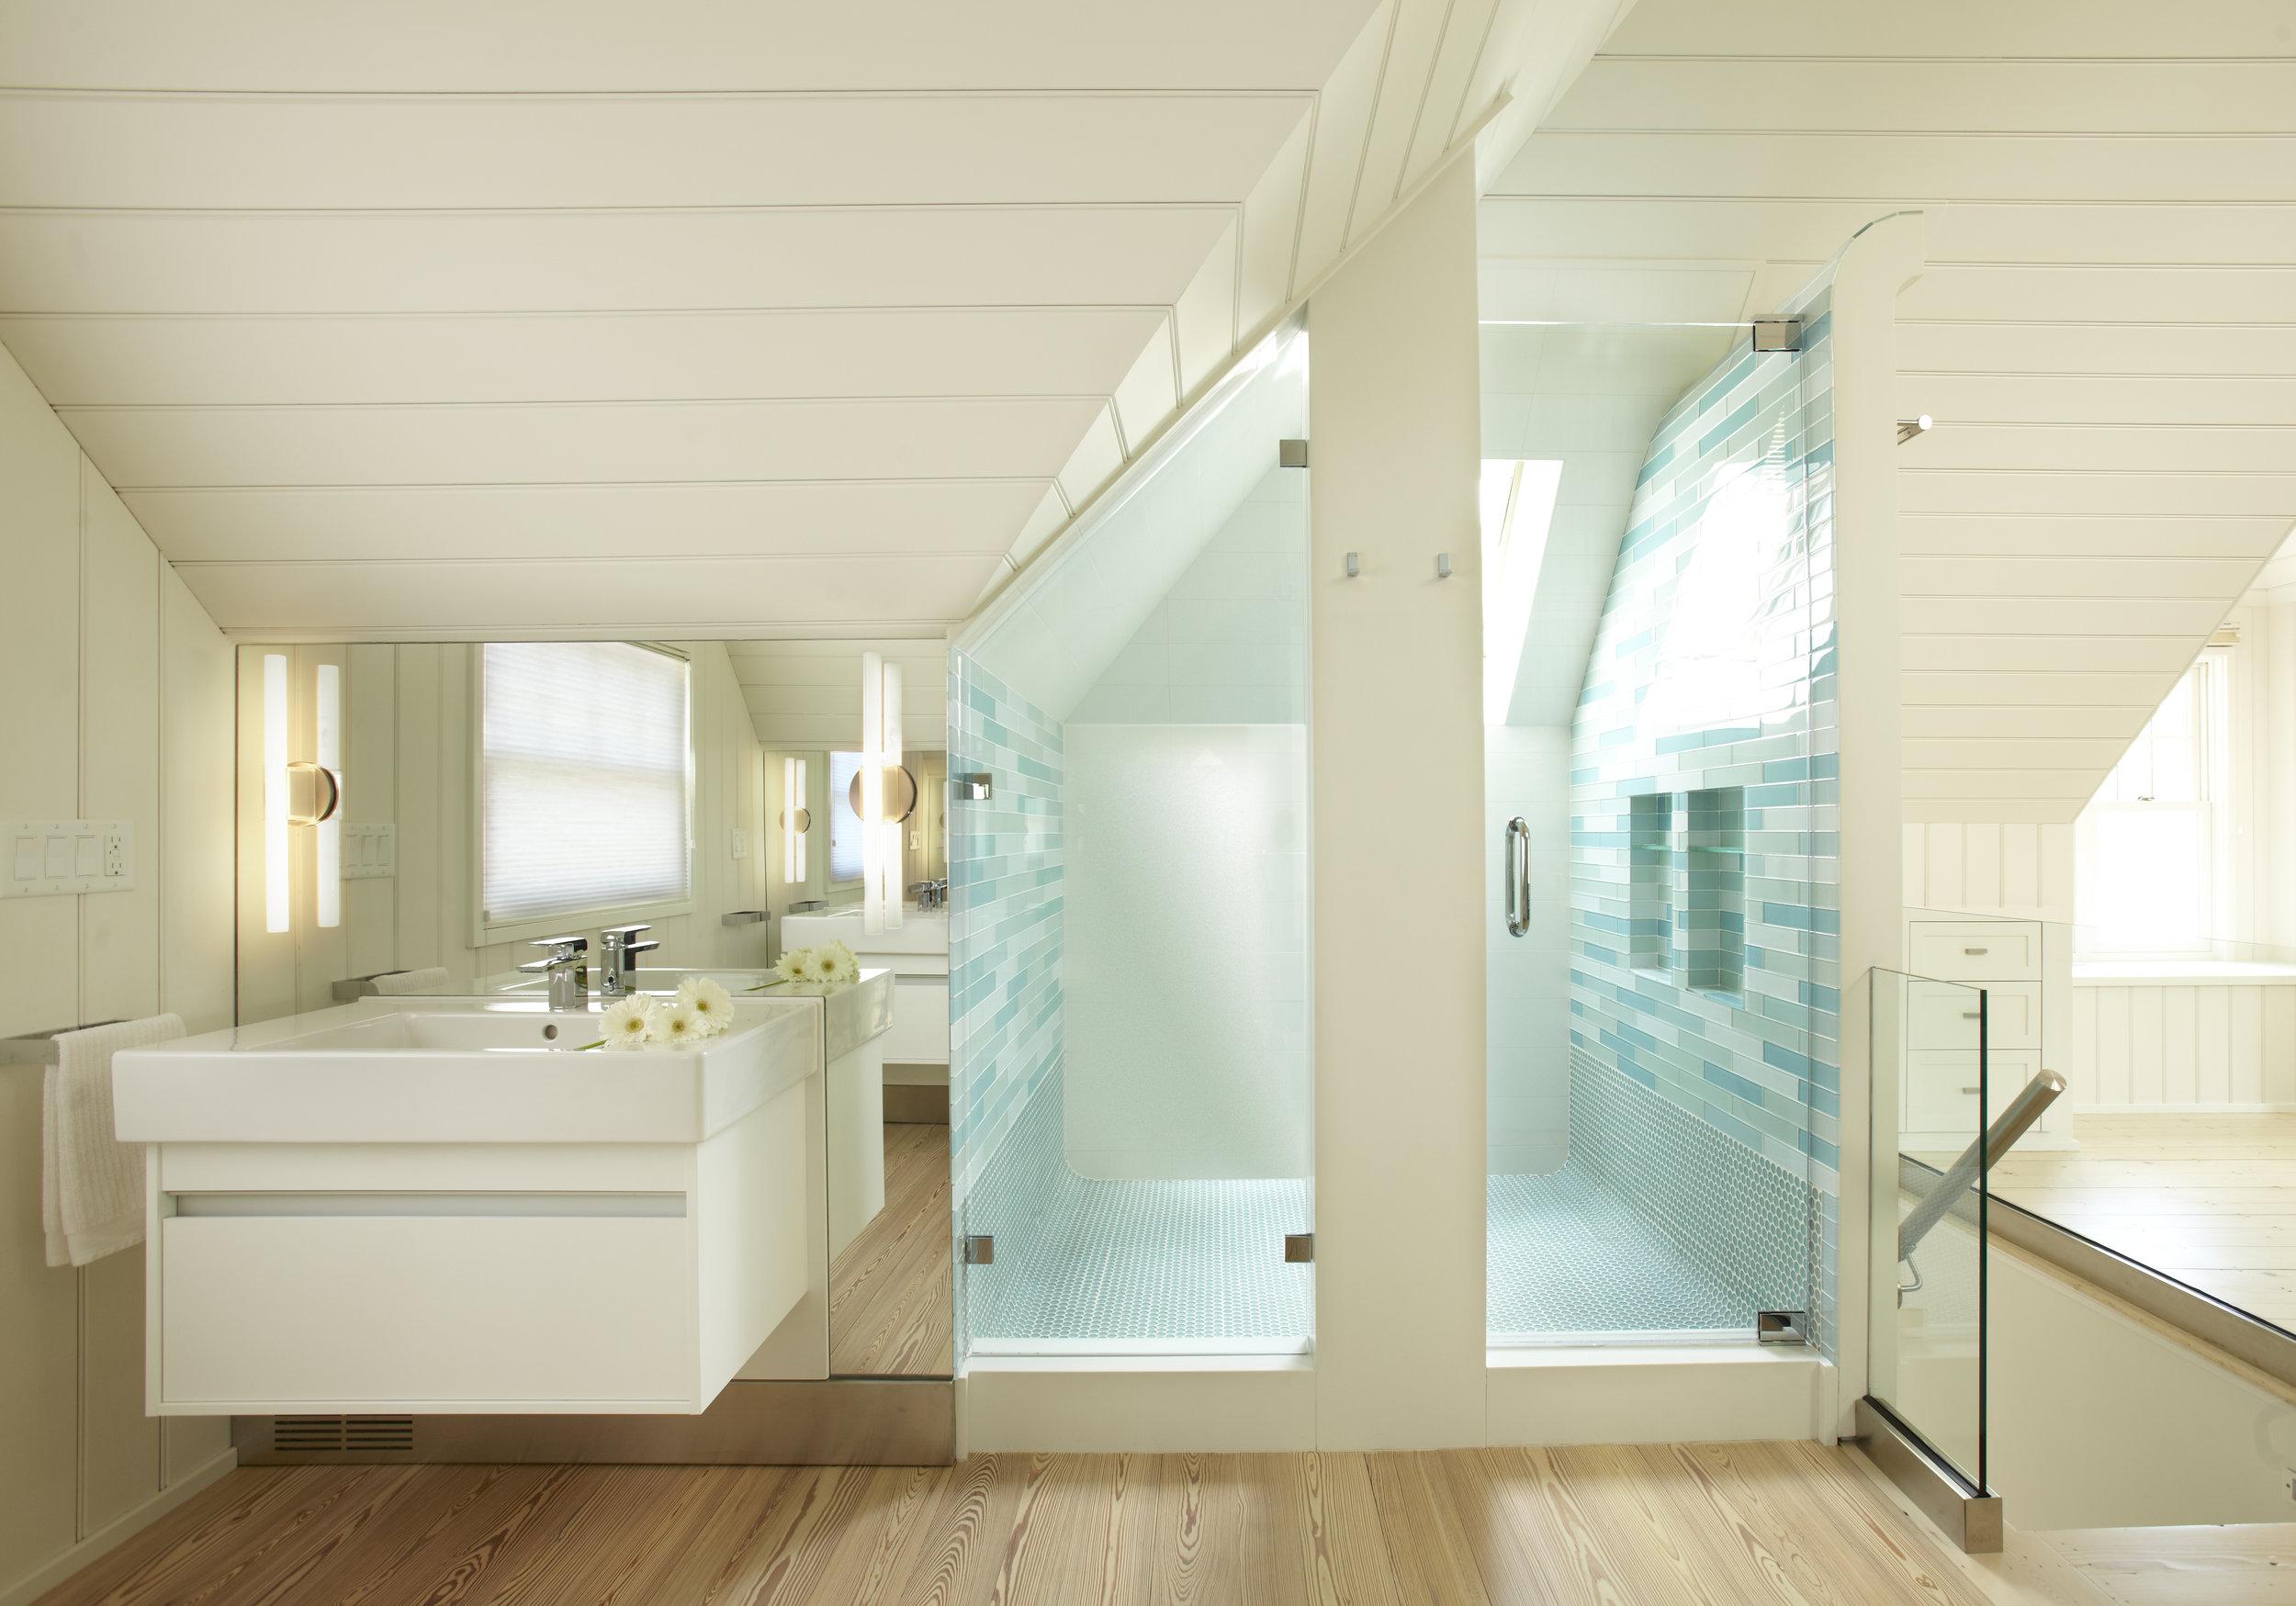 kennard architects - dana_bed_1_final.jpg